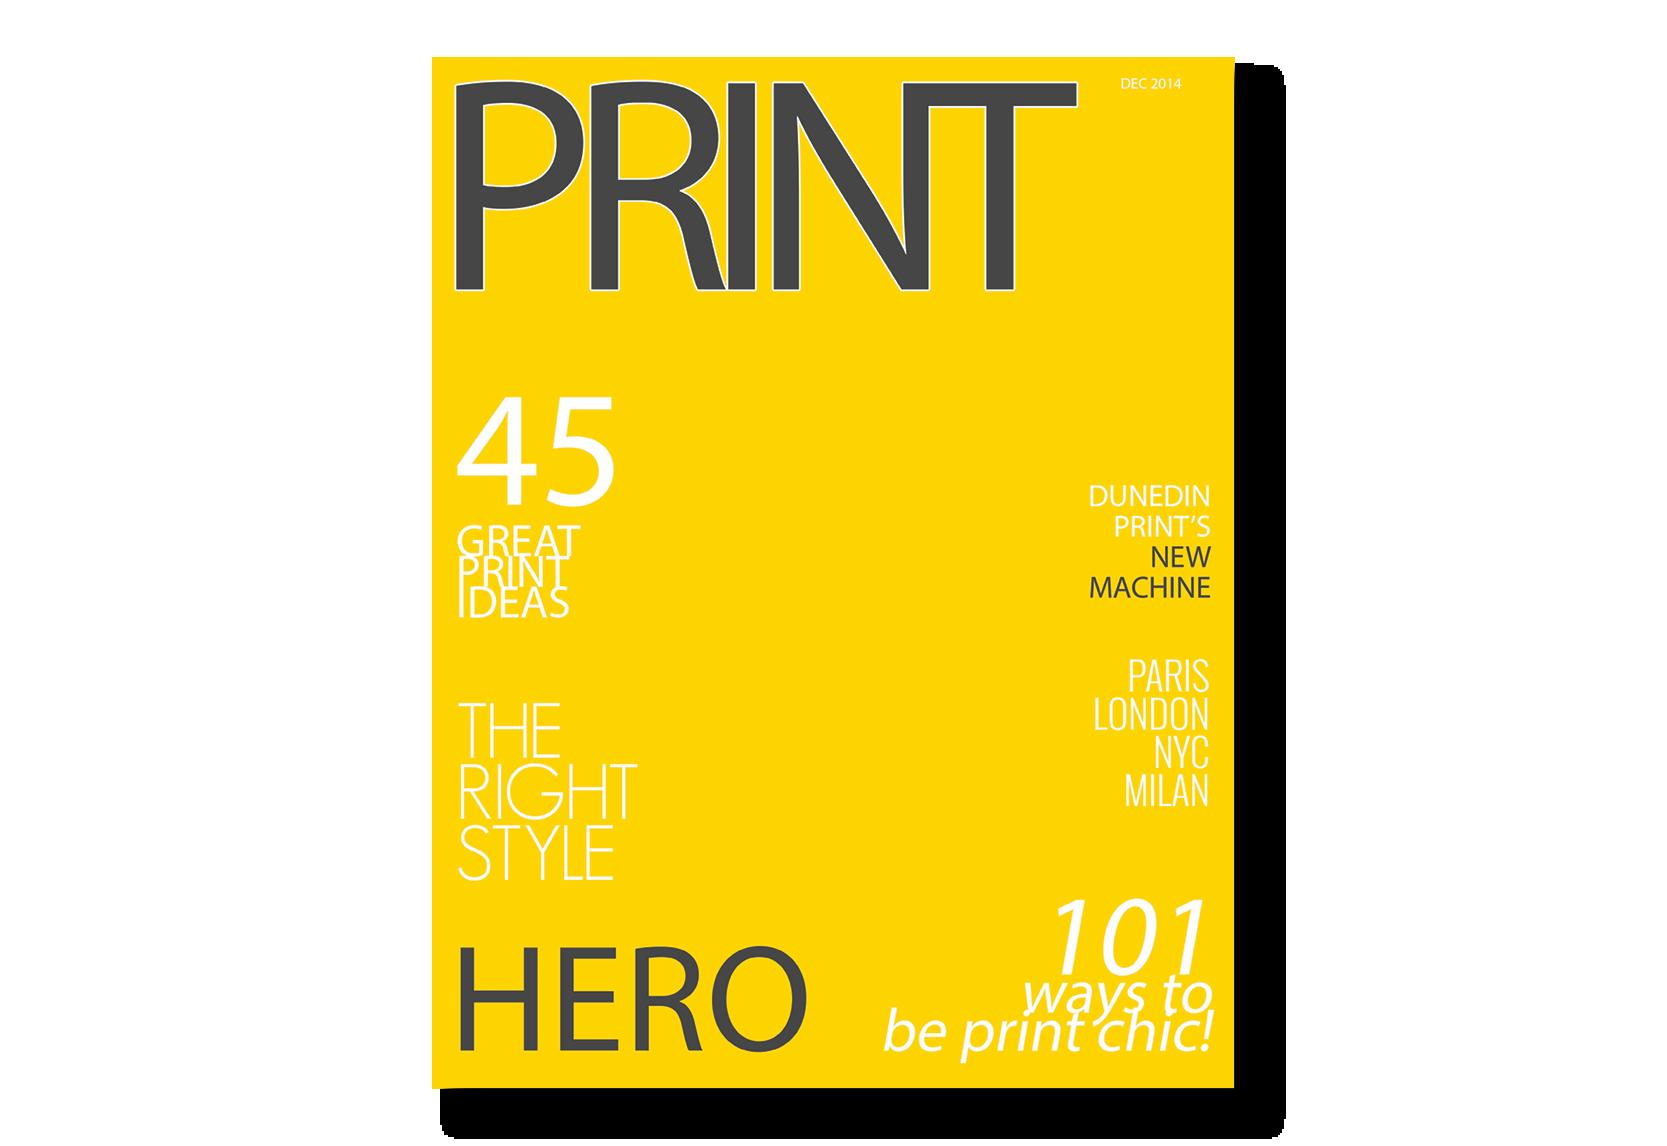 Books & Magazines, Dunedin Print, 297 Vogel Street, Dunedin3